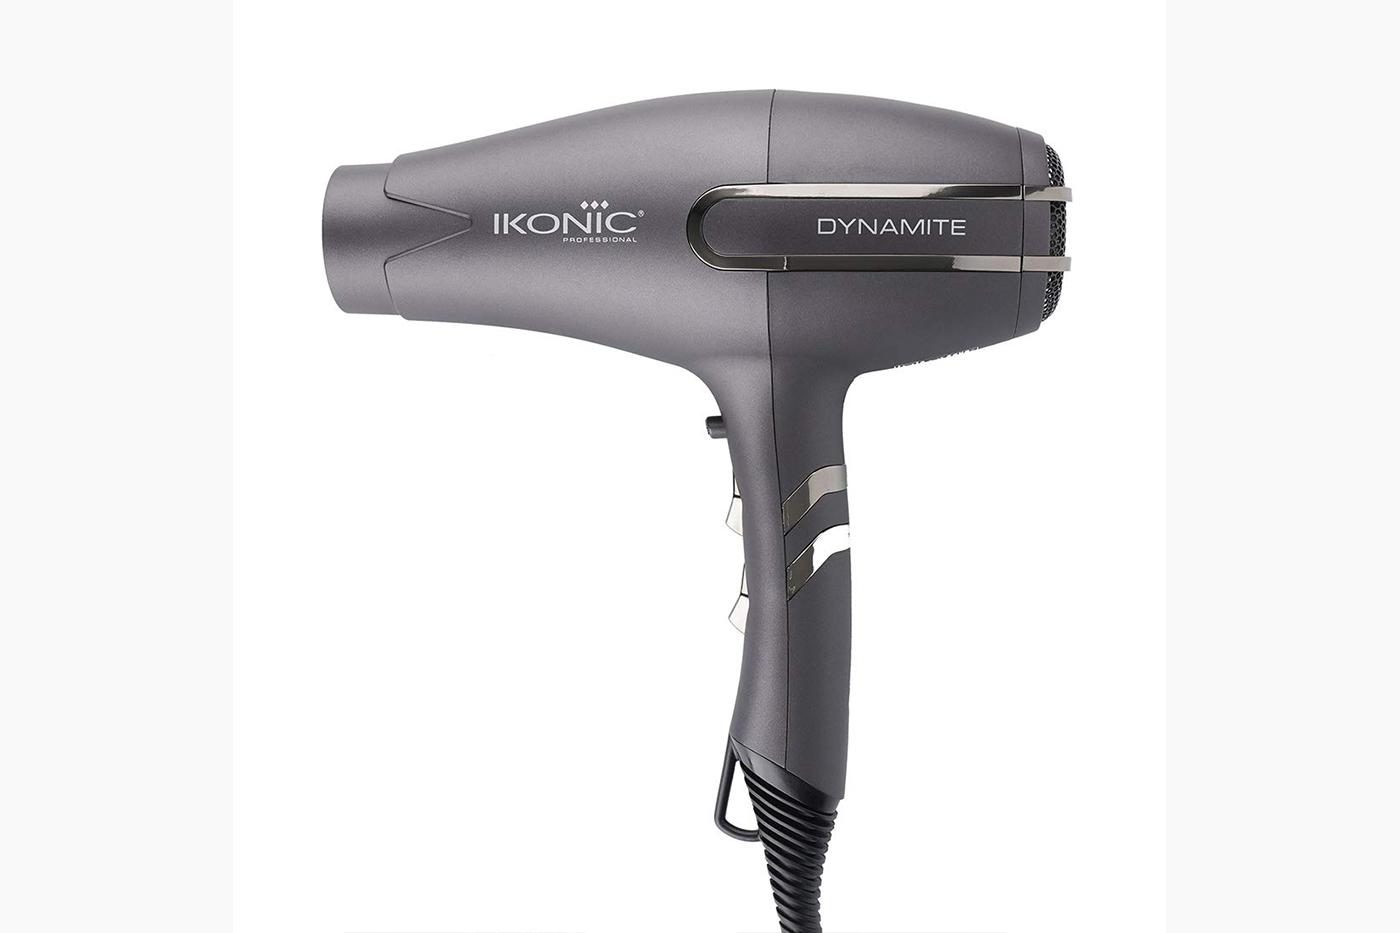 Ikonic's dynamic hair dryer